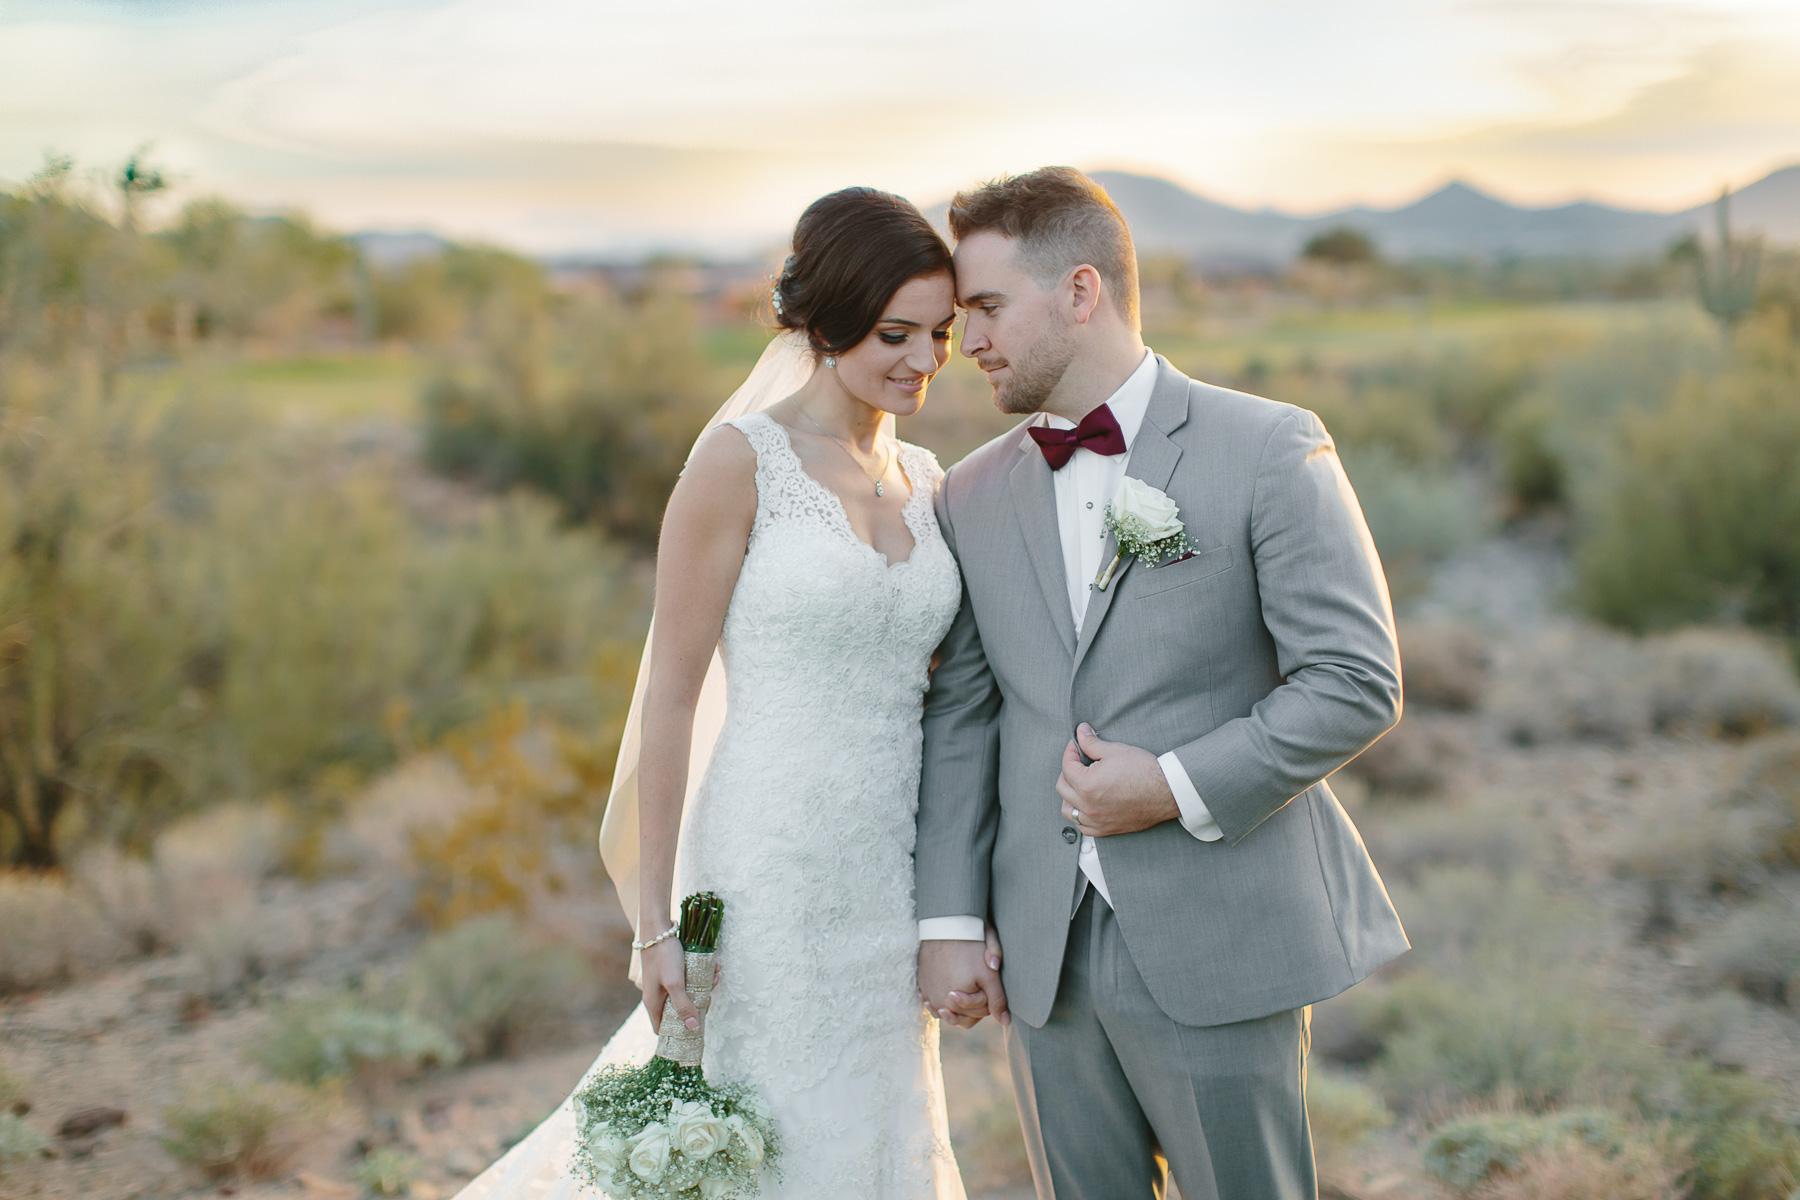 161210-Luxium-Weddings-Arizona-Matt-Jenny-Anthem-Golf-Country-Club-1058.jpg